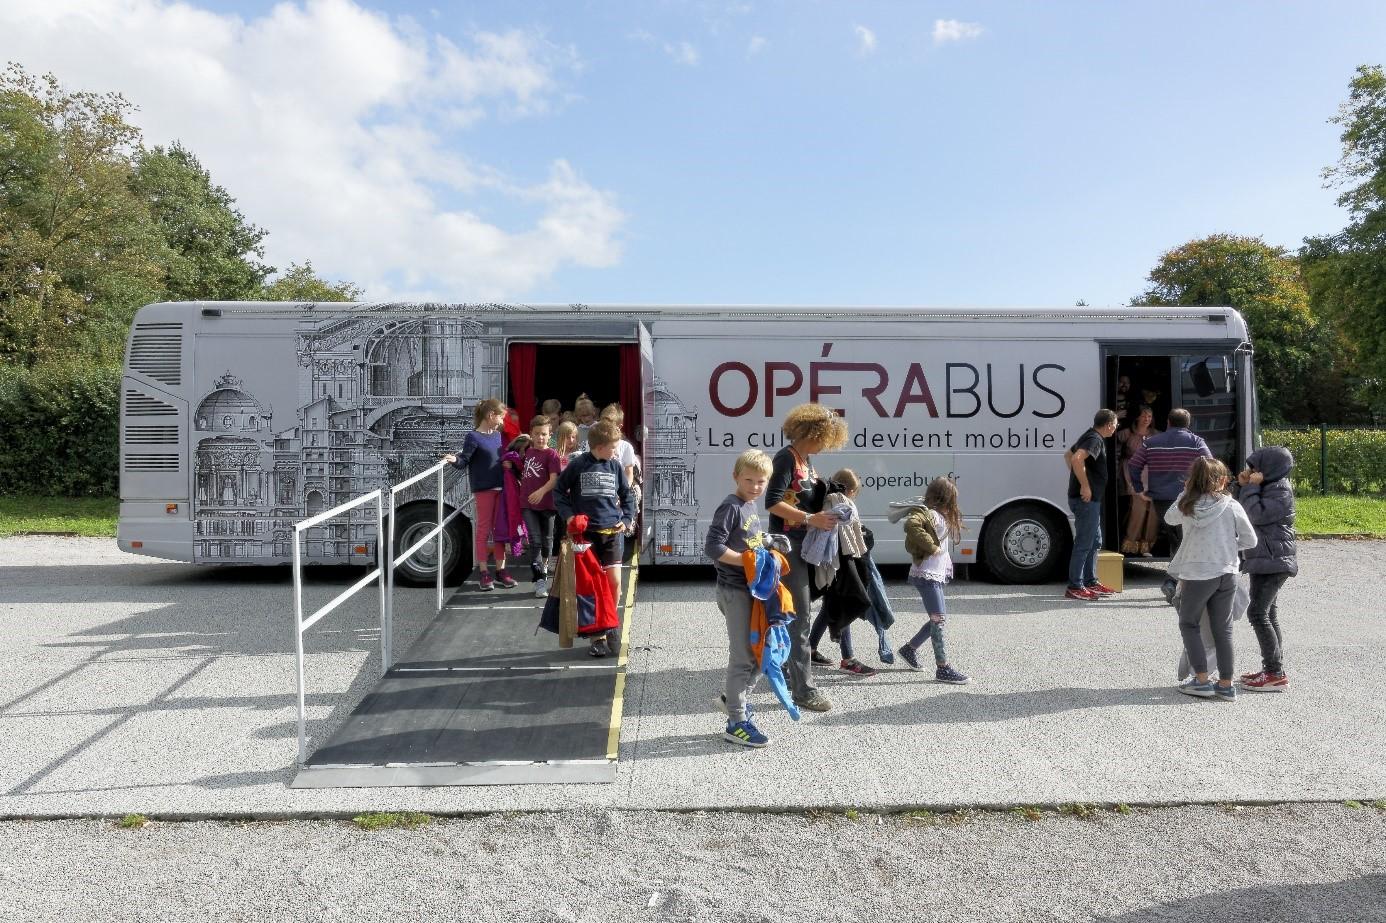 opera bus.jpg